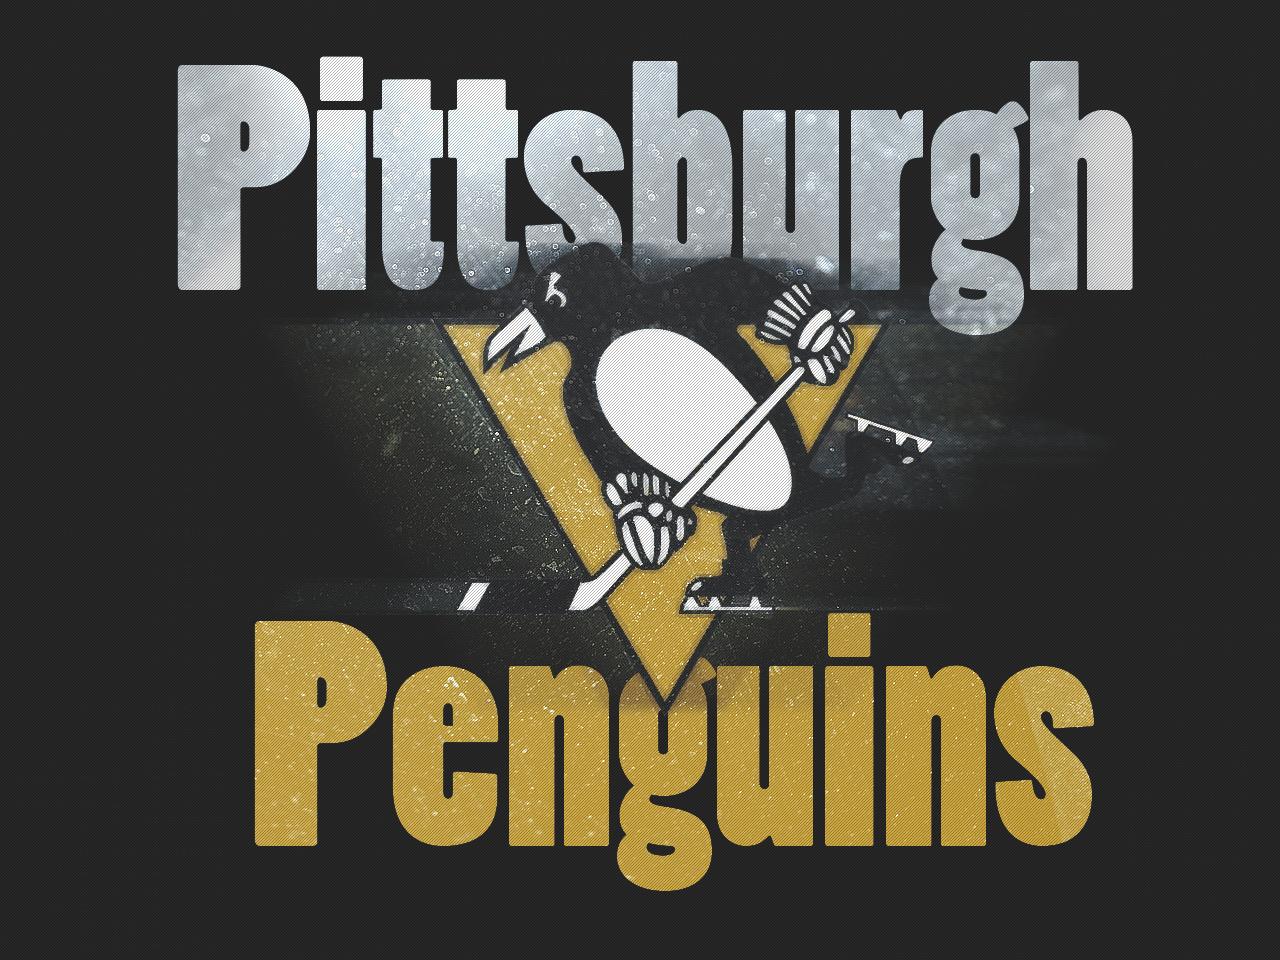 Free Download Download Pittsburgh Penguins Logo Image